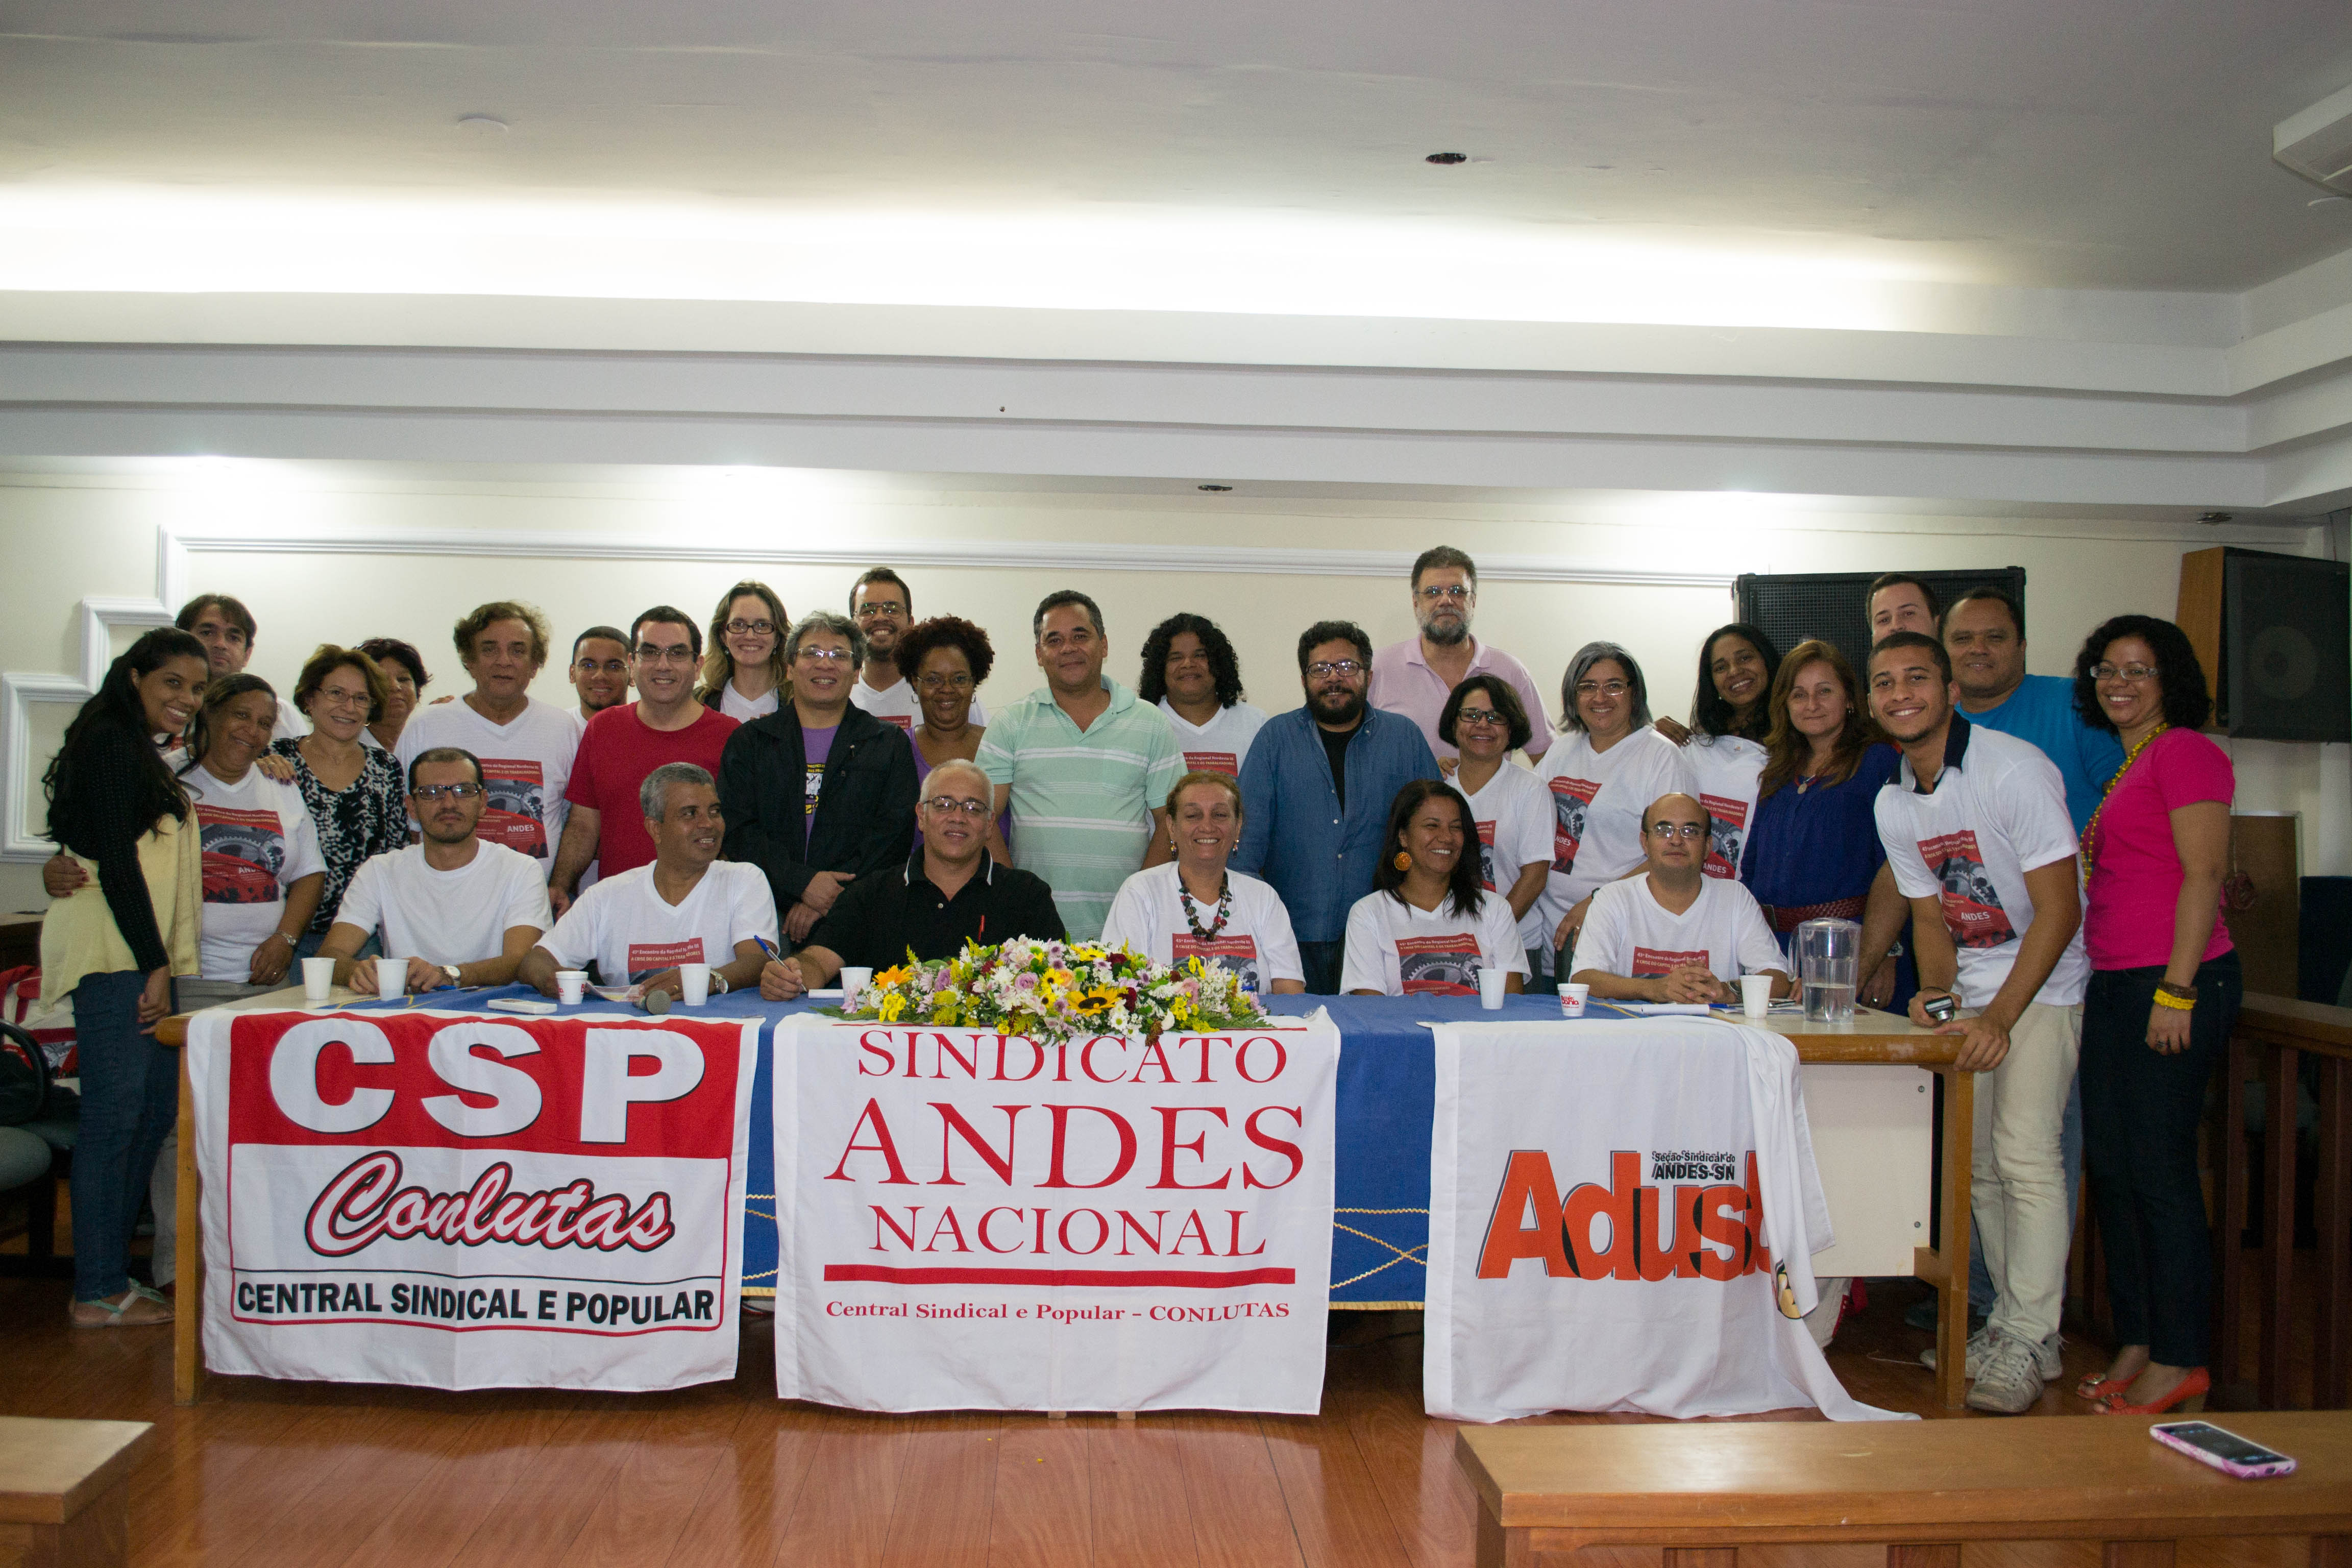 49º Encontro da Regional Nordeste III Andes- SN acontecerá nos dias 15 e 16 de maio